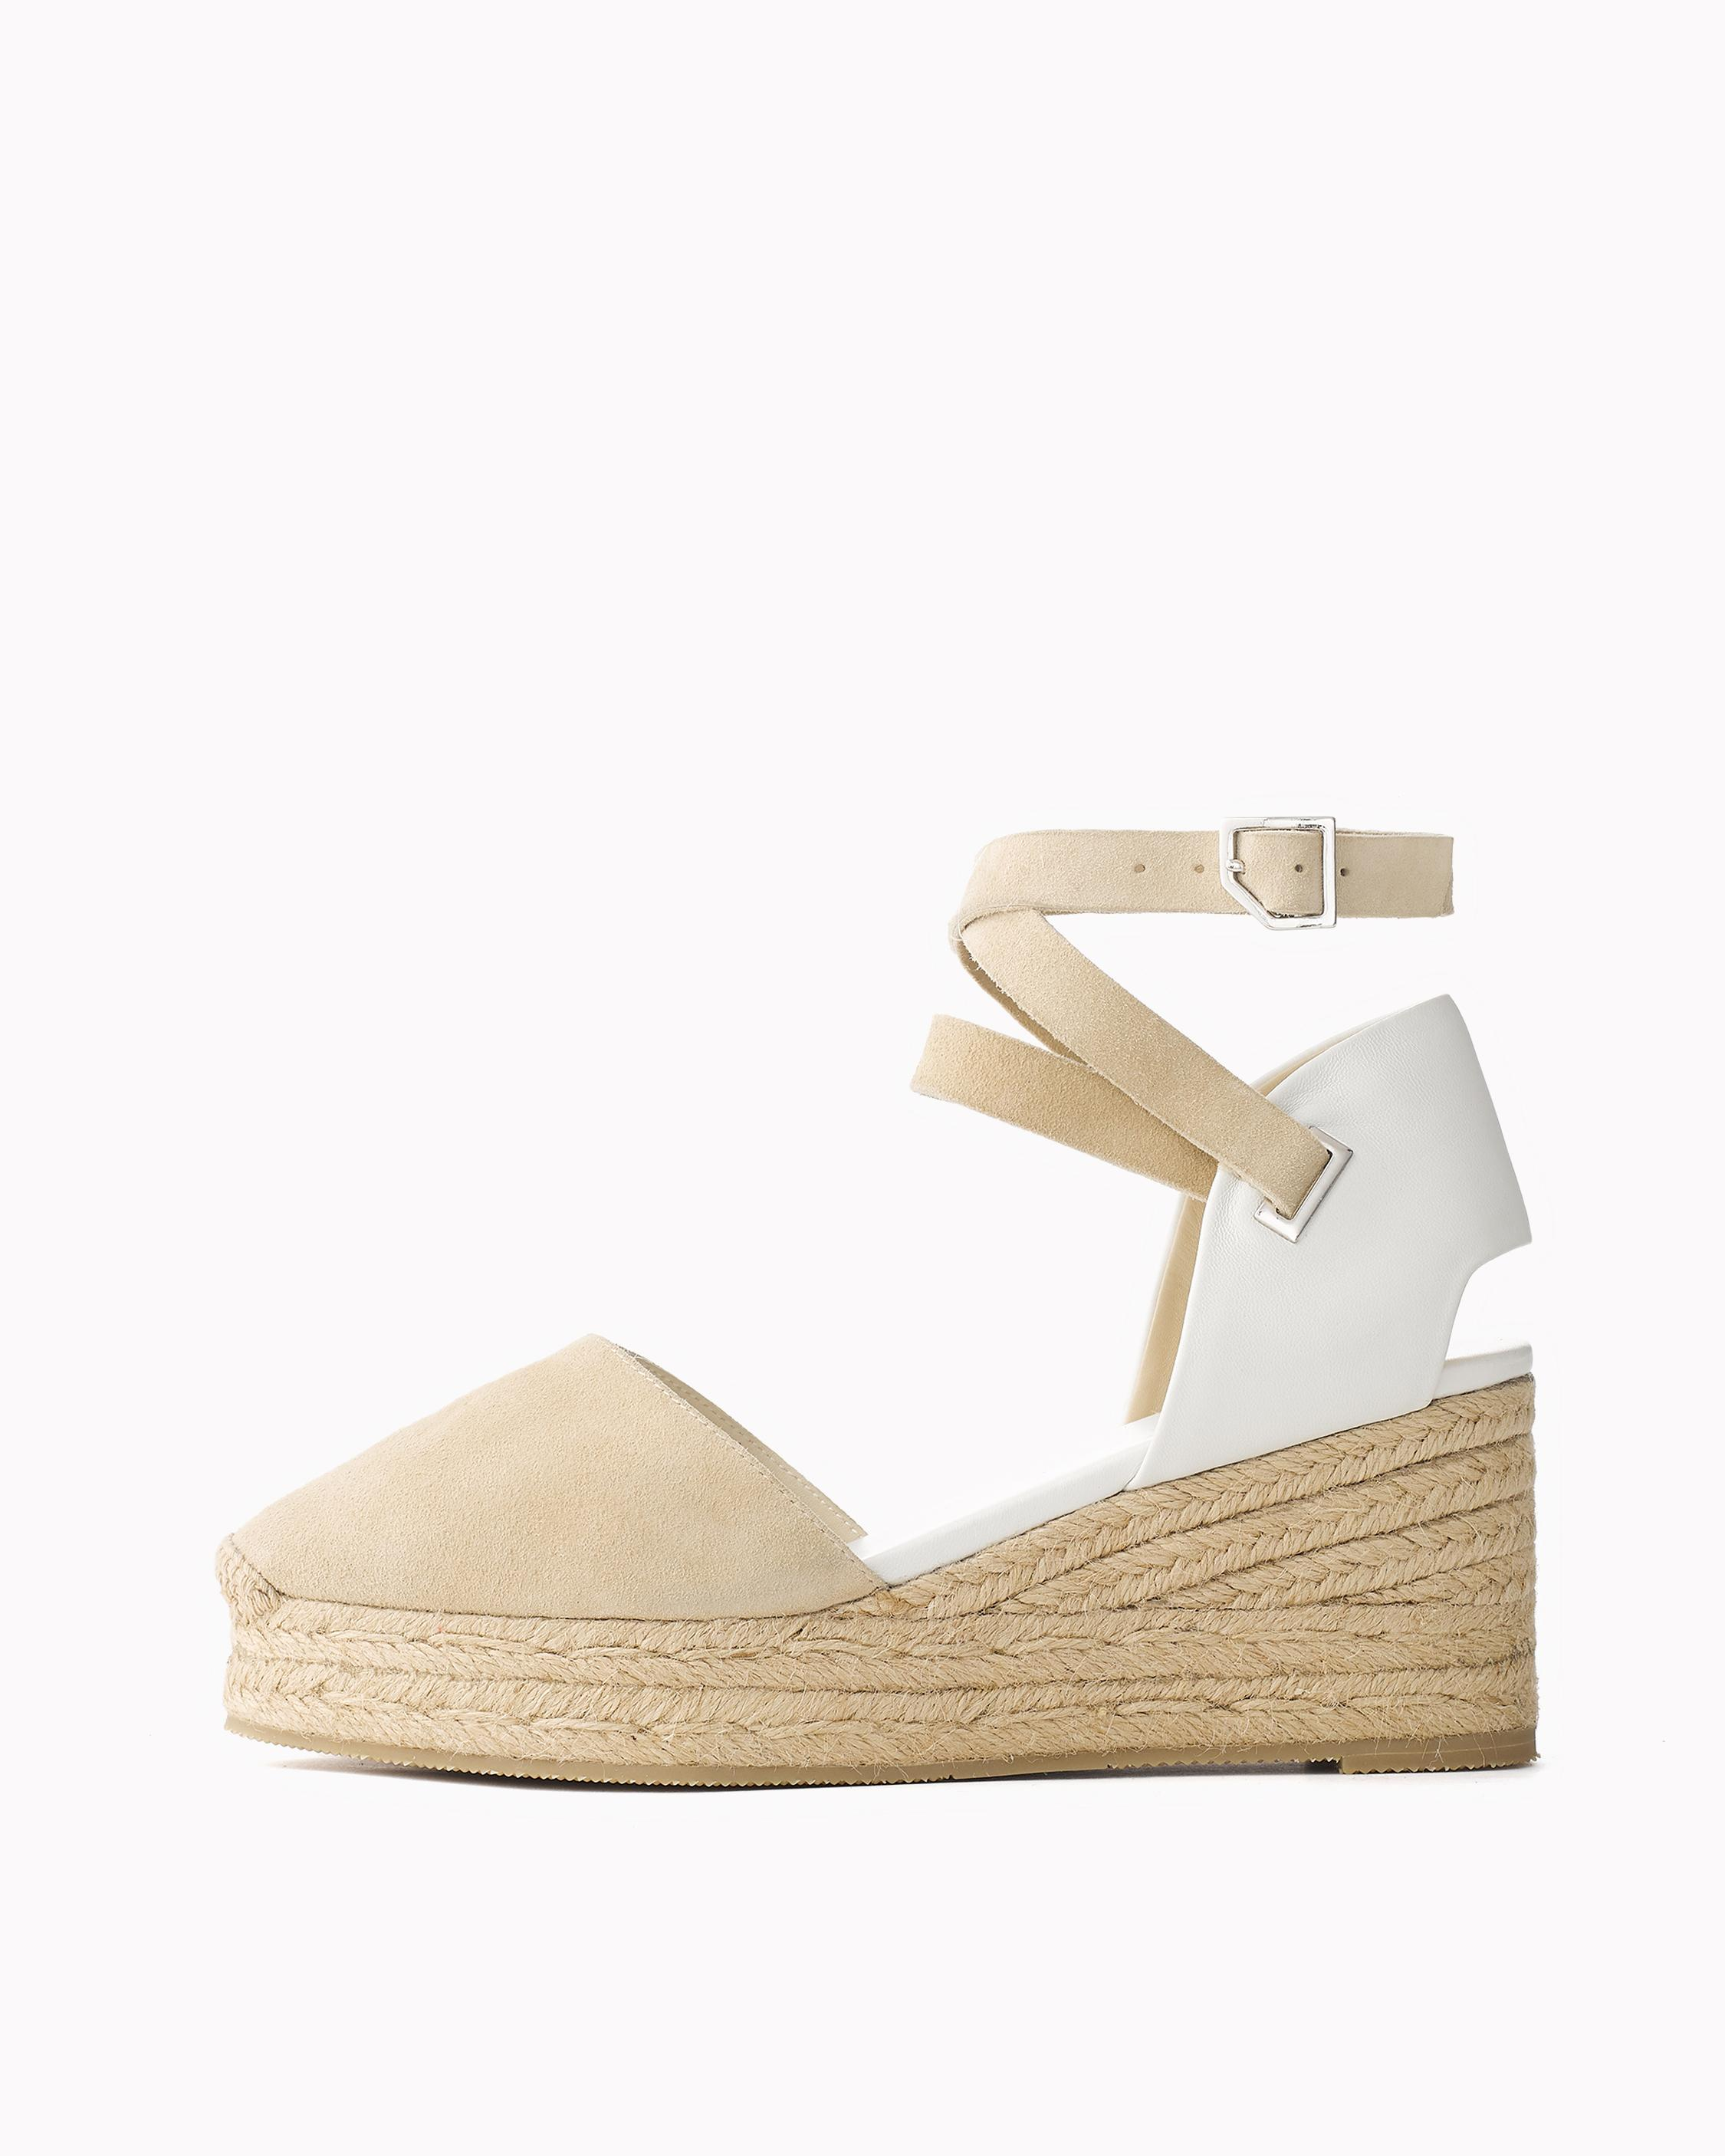 Rag & Bone Woman Suede Platform Espadrille Sandals Sand Size 41 Rag & Bone Pre Order Cheap Price Outlet Eastbay ymAIb8Uk